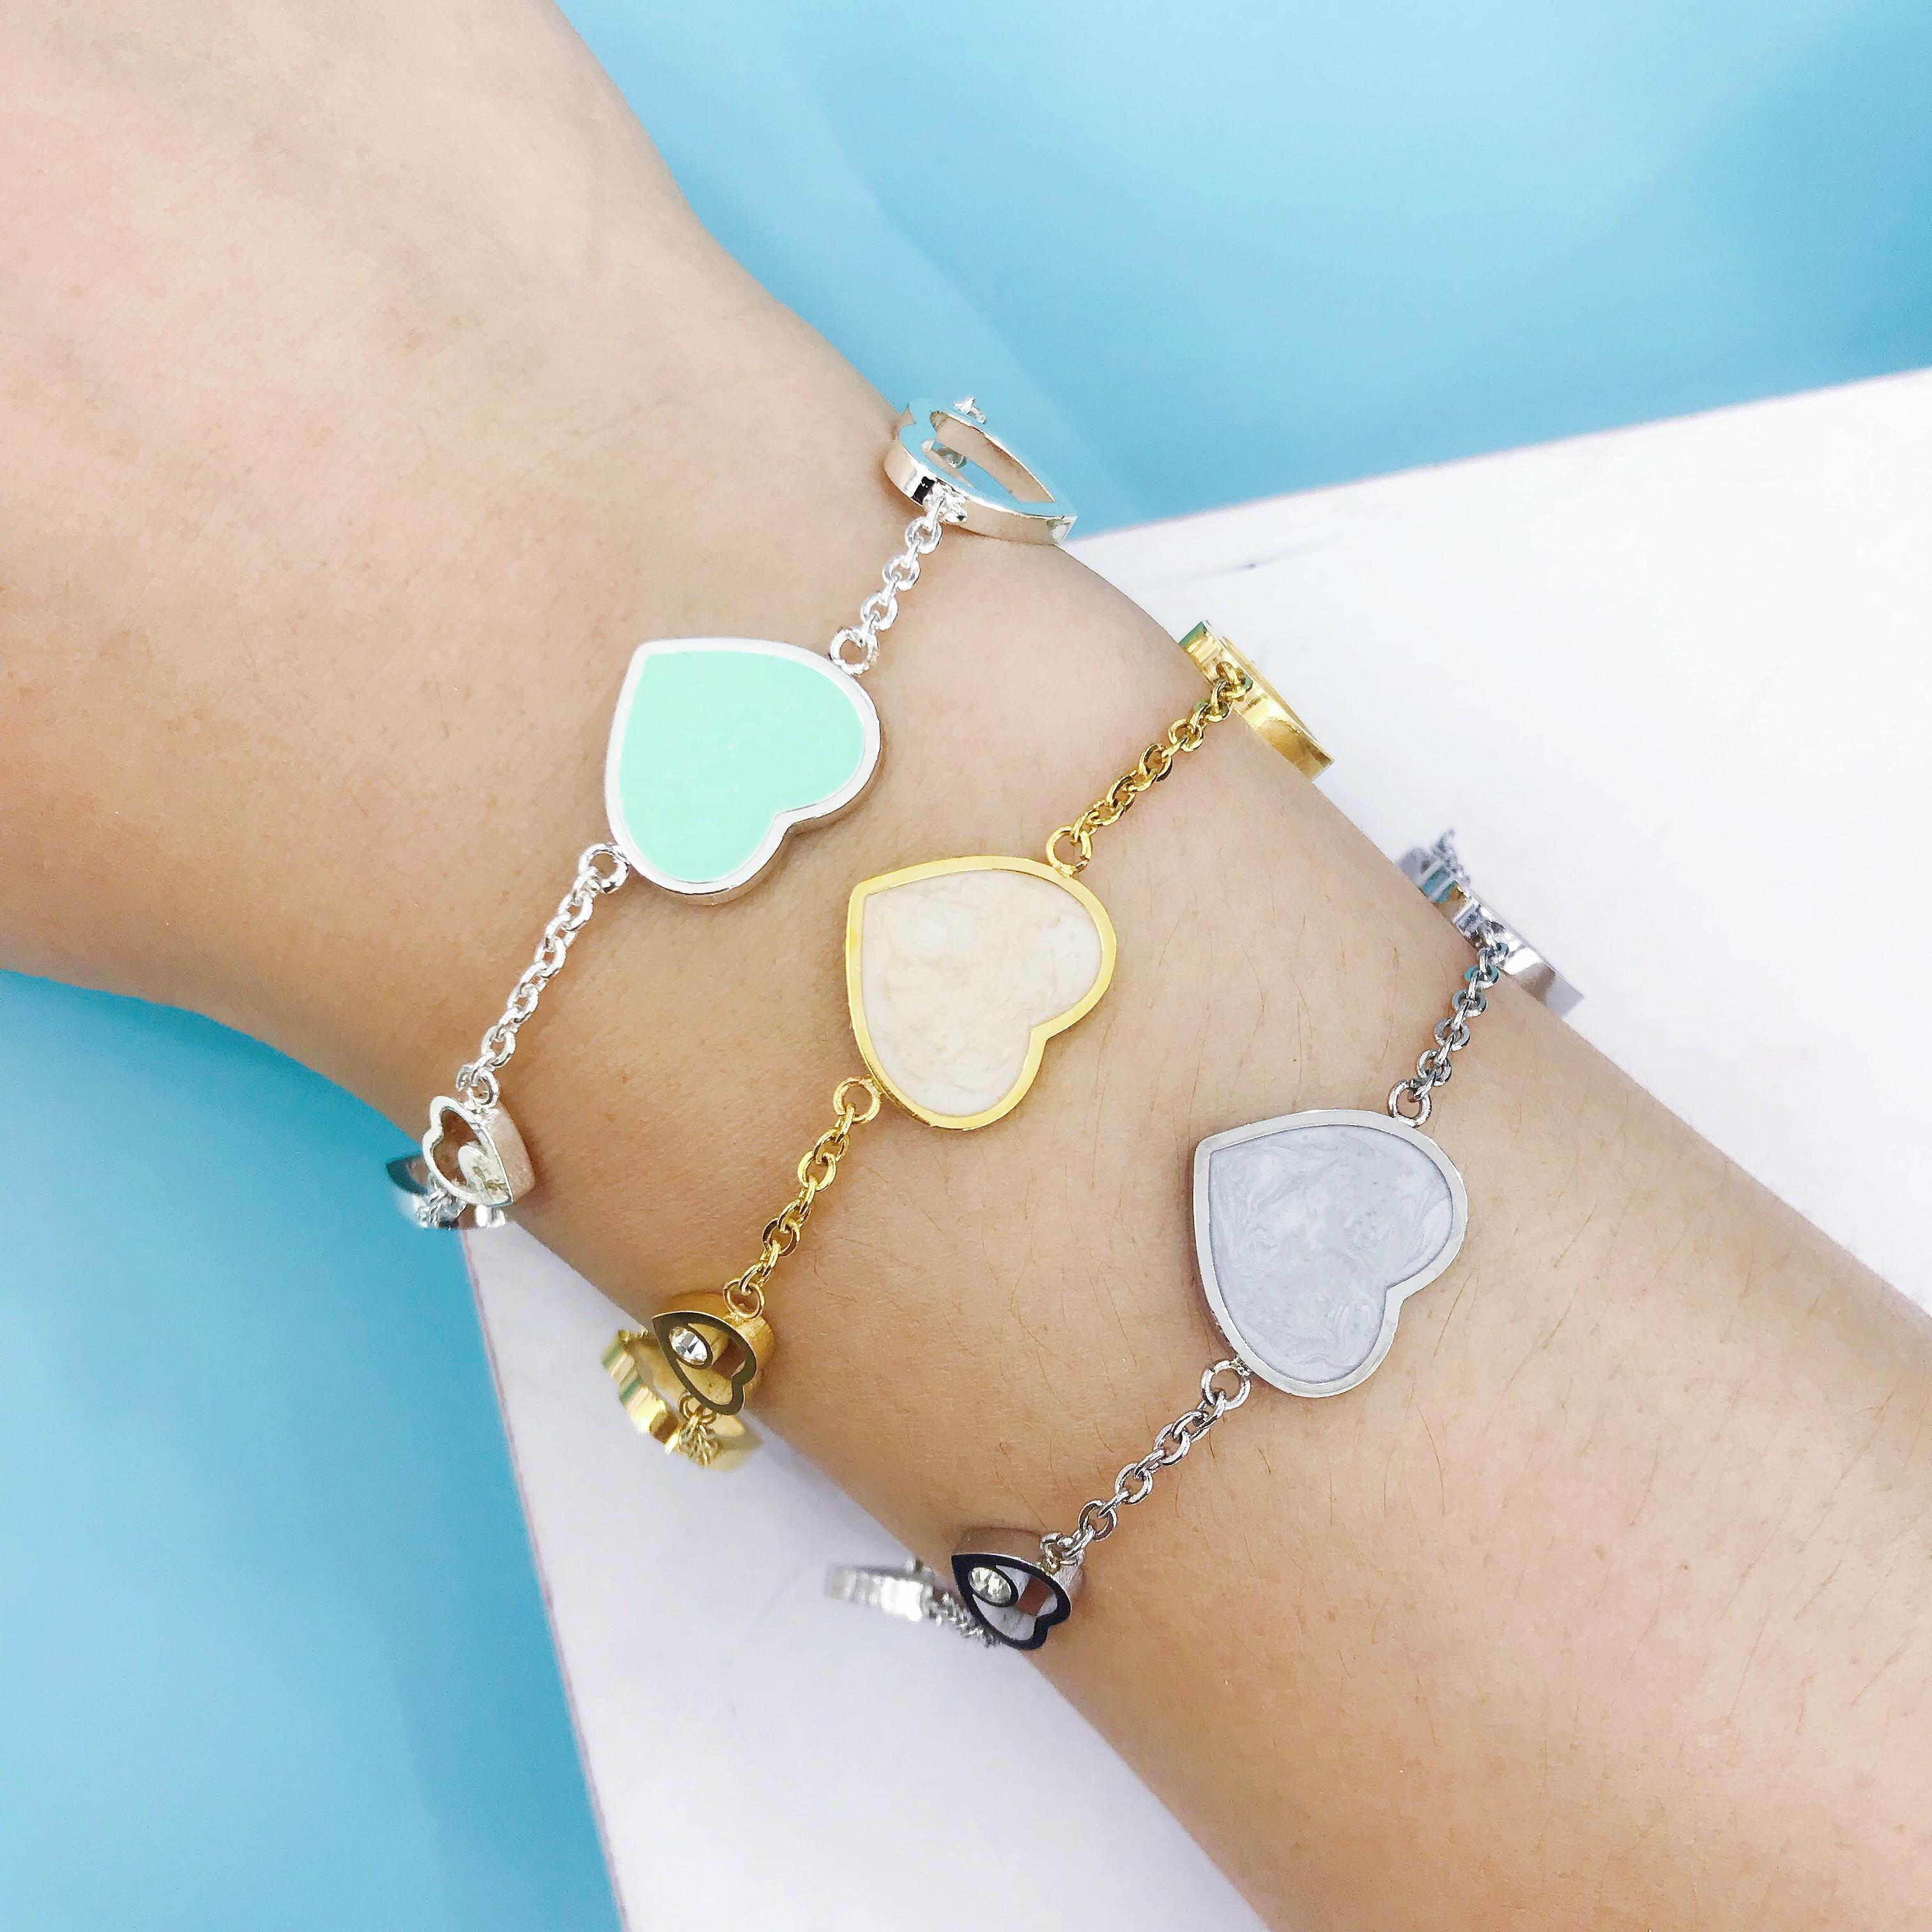 New Fashion Heart Shaped Gold Silver Pendant Bracelet Jewelry Charm Brand Bracelet Design For Women Fine Jewelry|Strand Bracelets| |  - title=